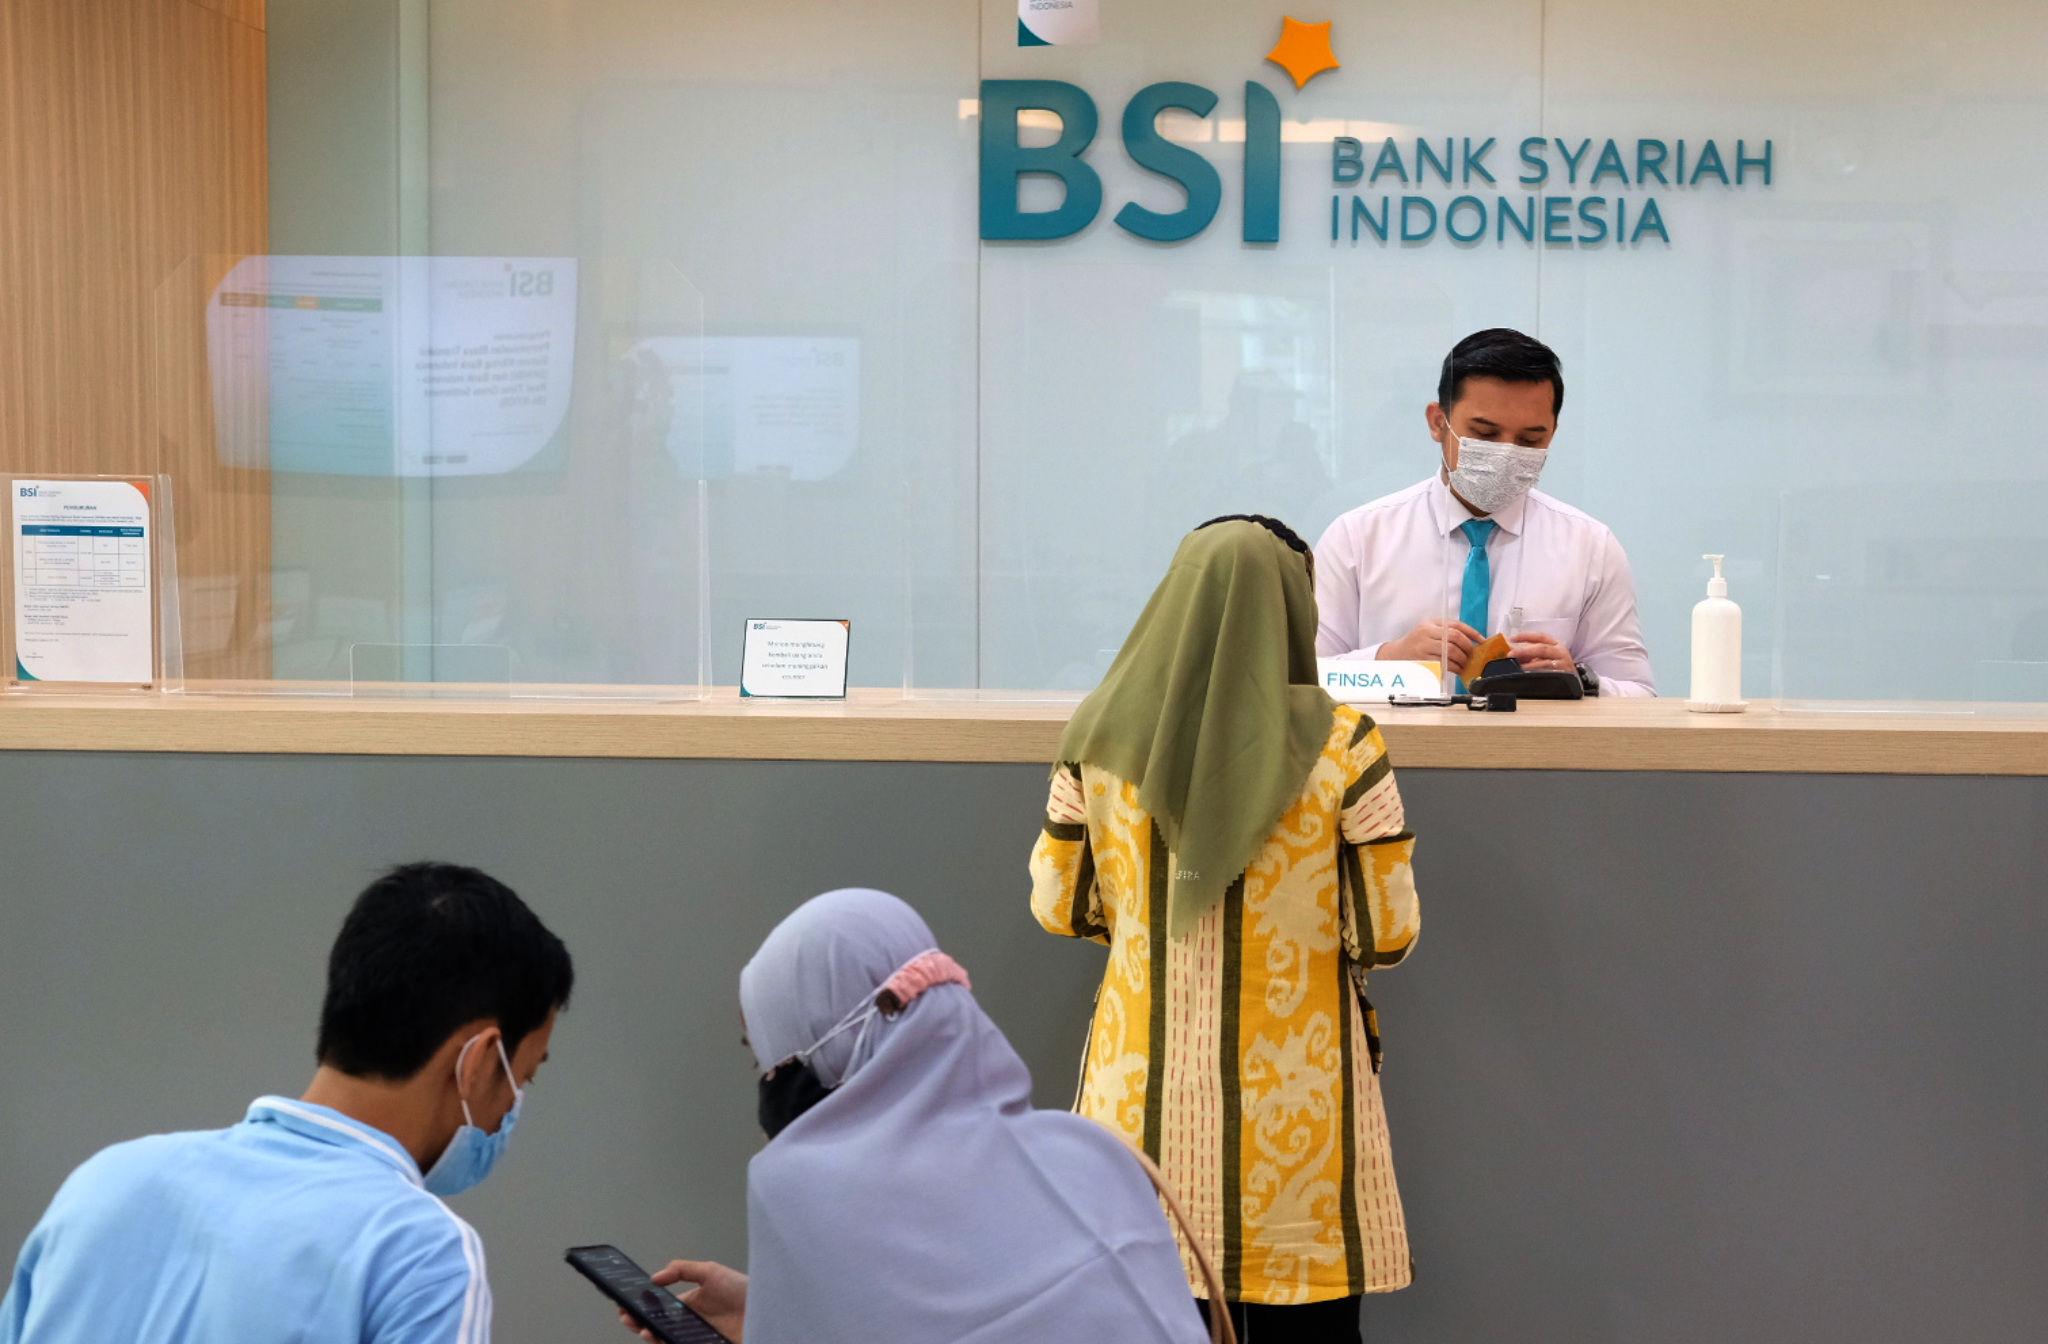 Prospek Market Share Perbankan Syariah Lewat Lahirnya Bank Syariah Indonesia (BRIS)